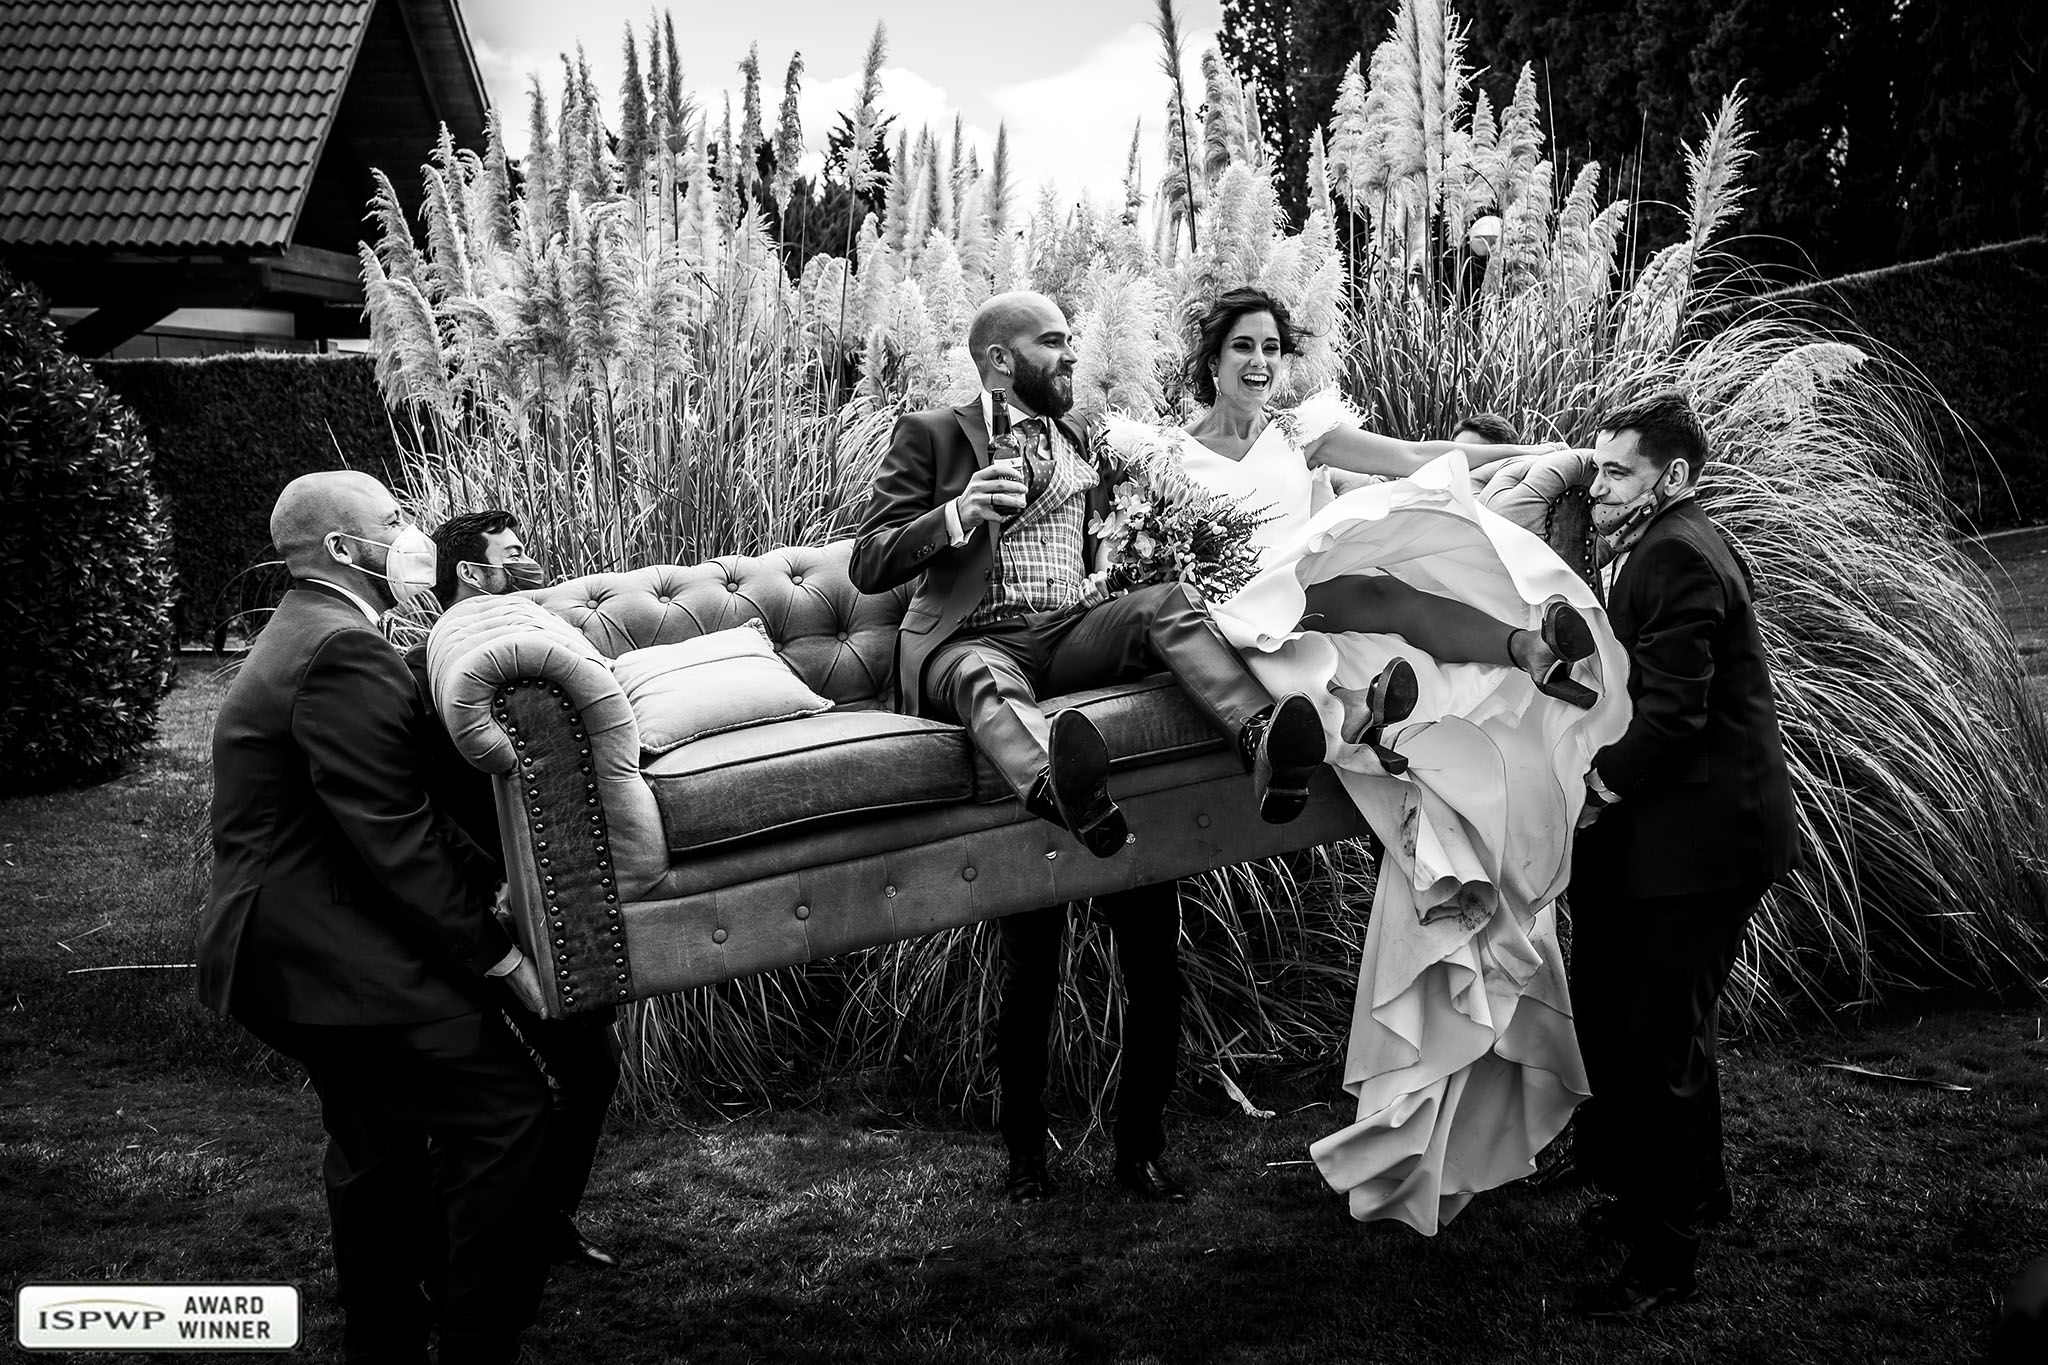 David Delgado Wedding Photography – ISPWP Award Winner – Winter 2021 Collection